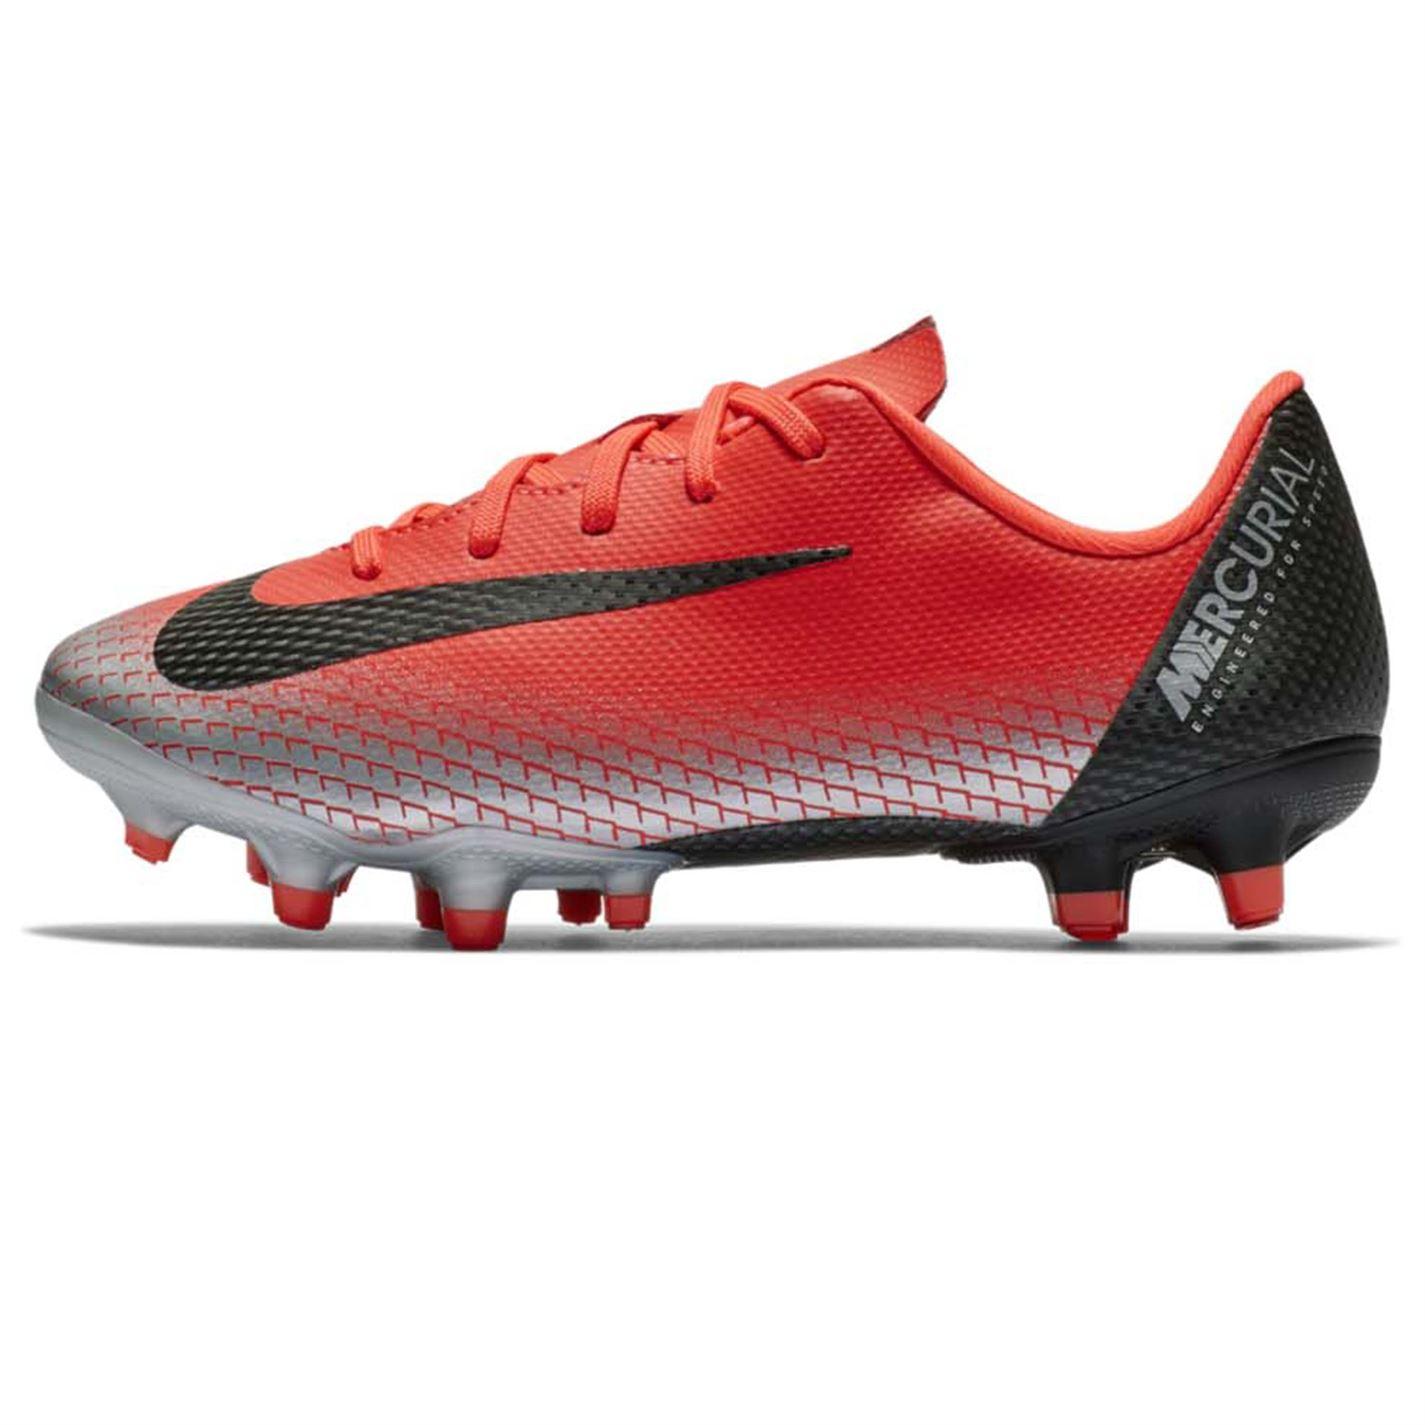 Nike Mercurial Vapor Academy CR7 Childrens FG Football Boots